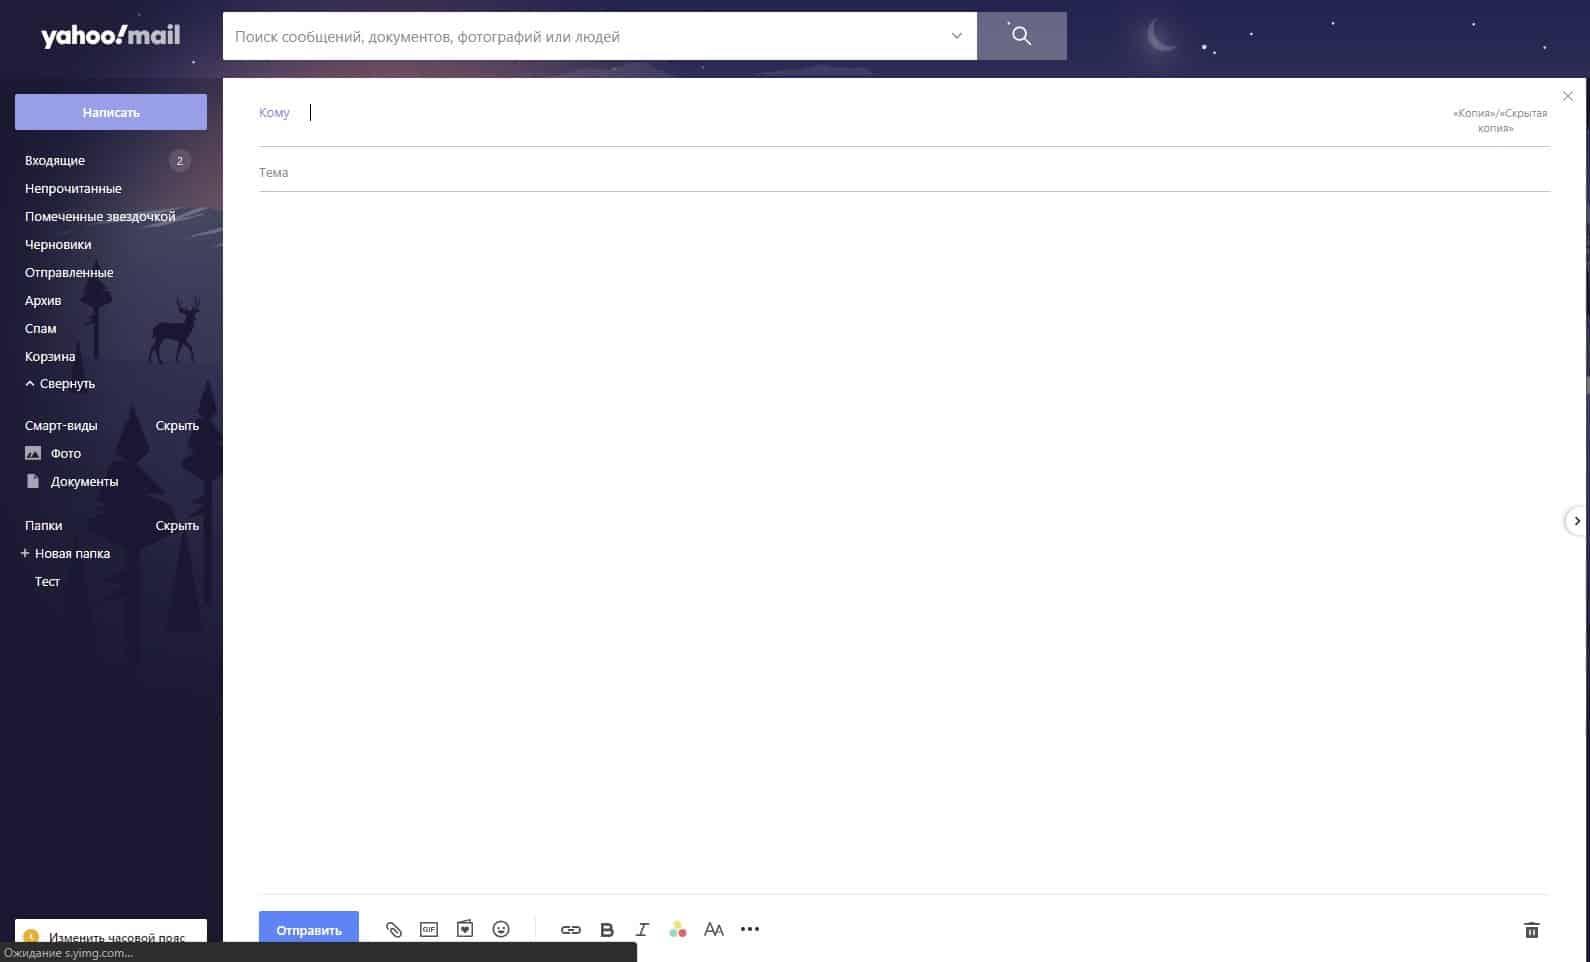 Плюсы и минусы Yahoo! Mail: отправка письма